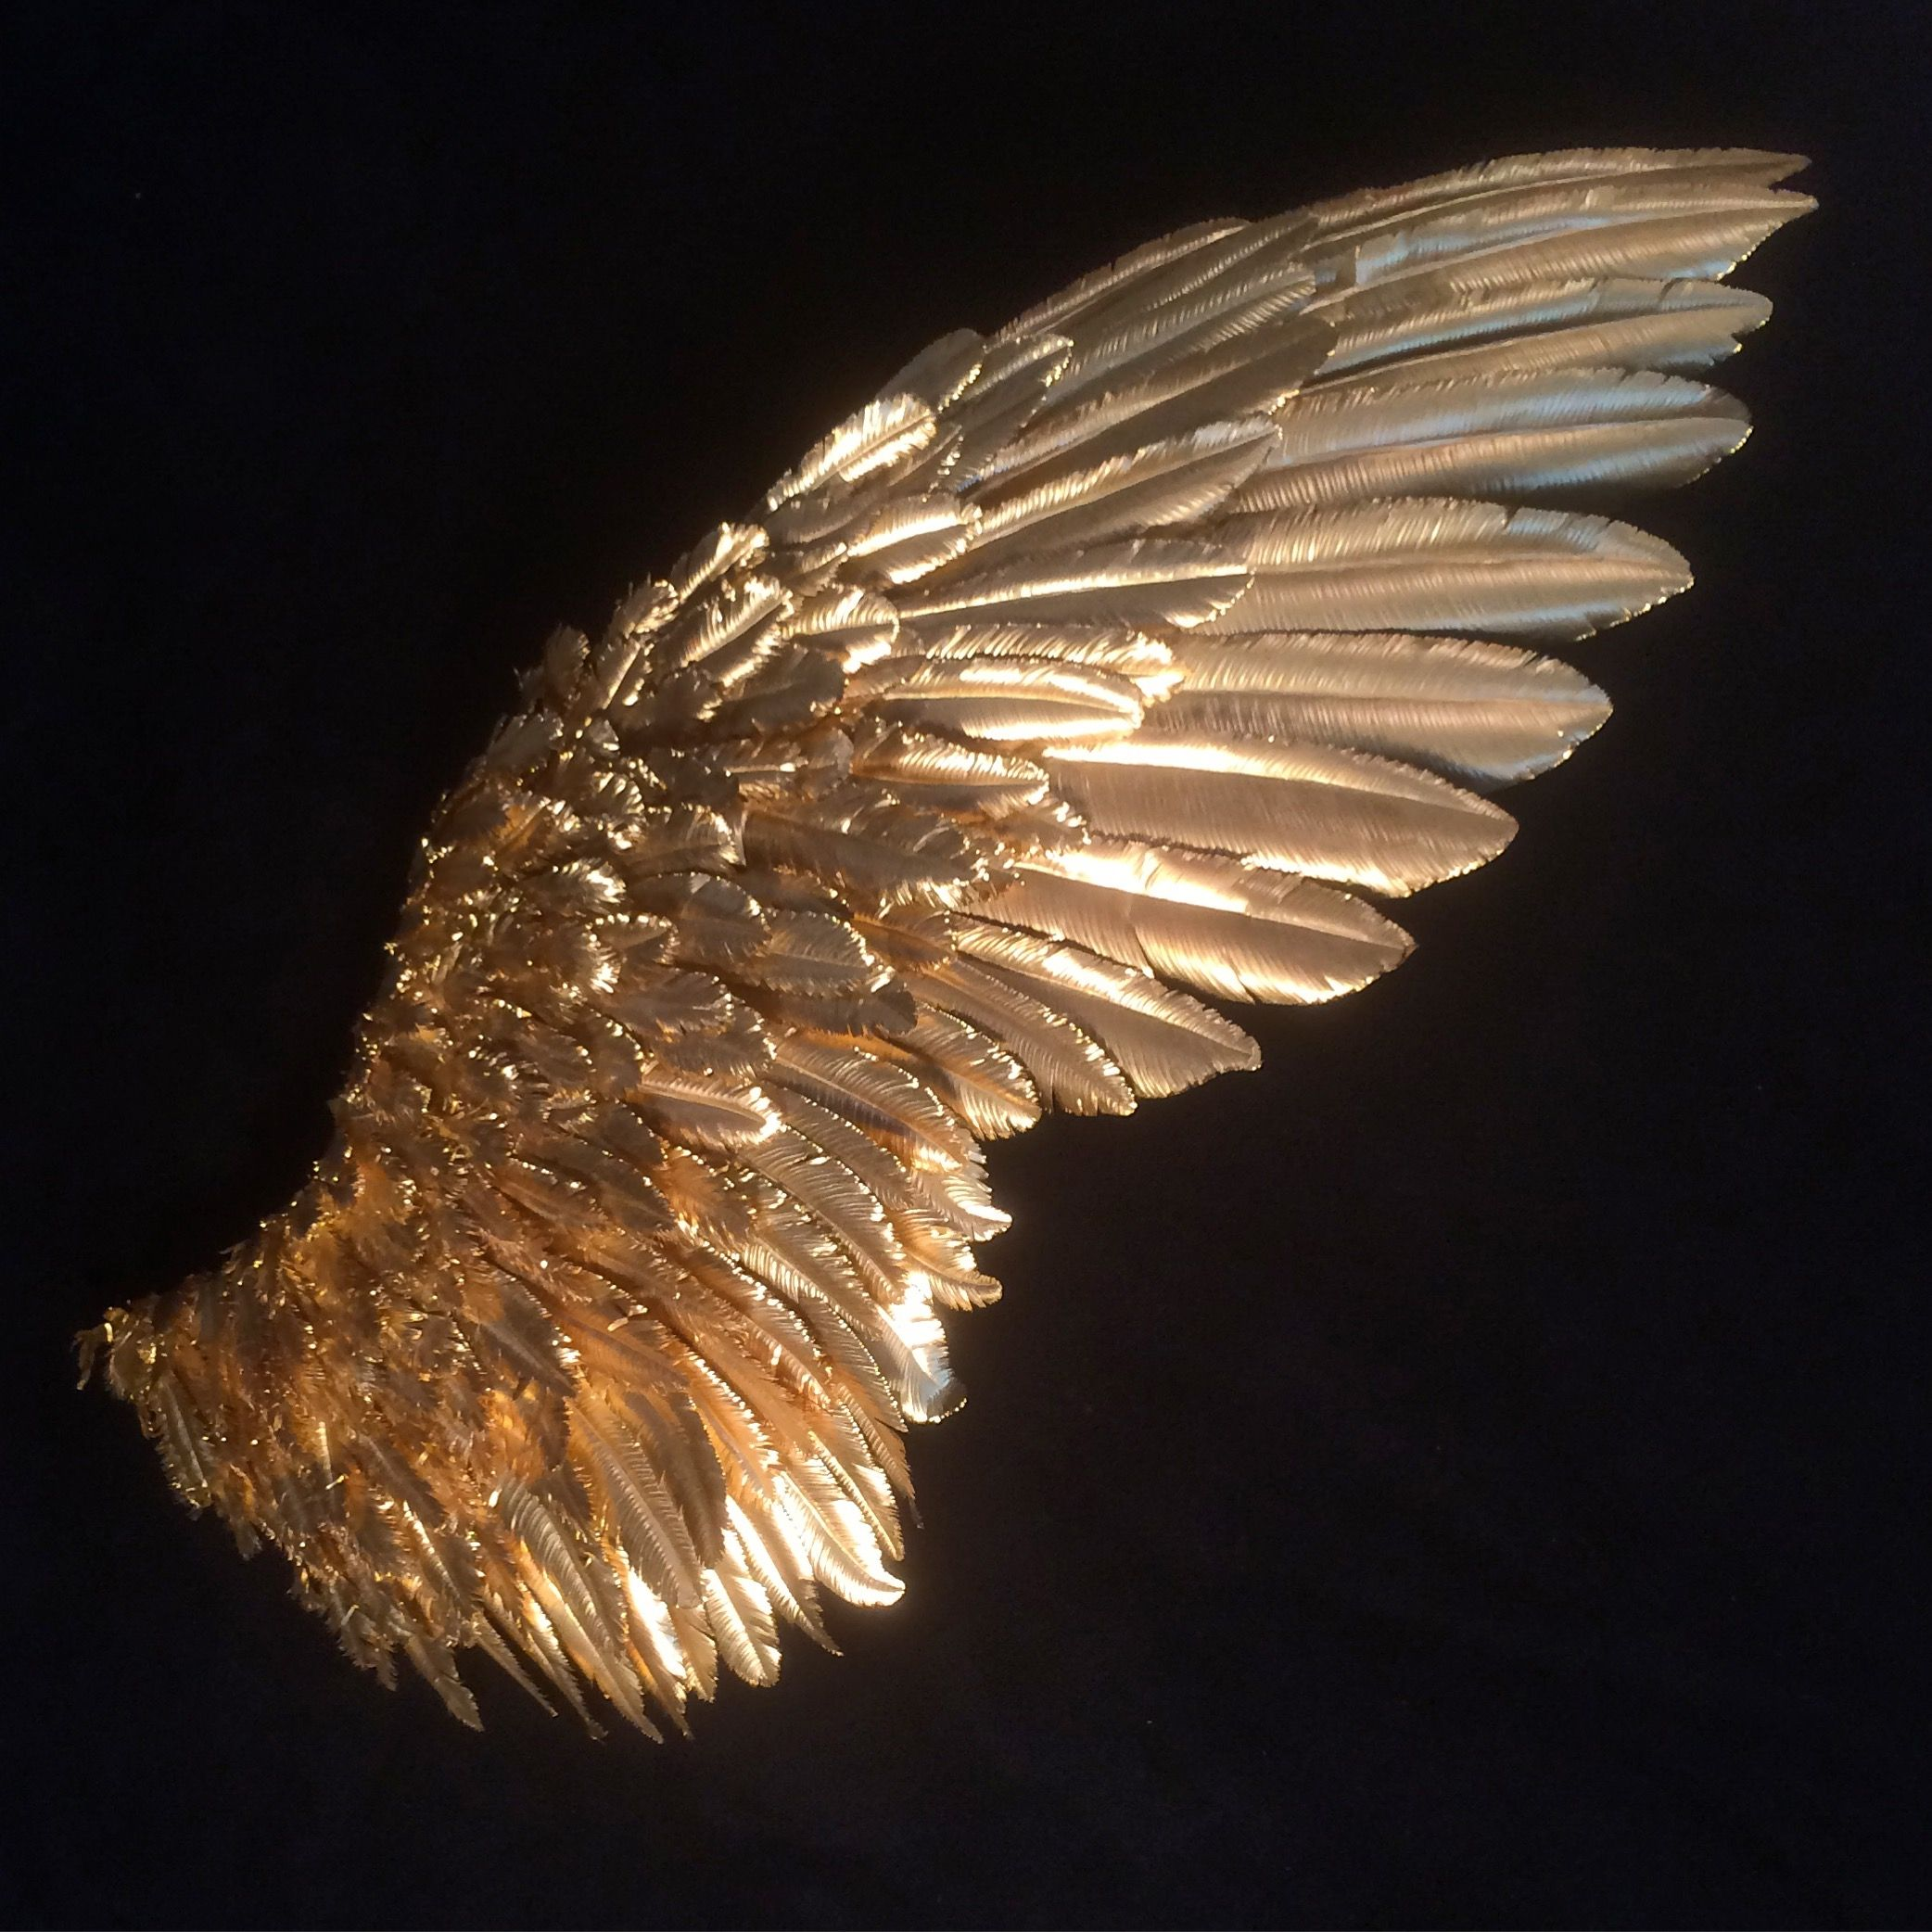 Pin by Loreley Schwarz on Eyes | Gold aesthetic, Angel